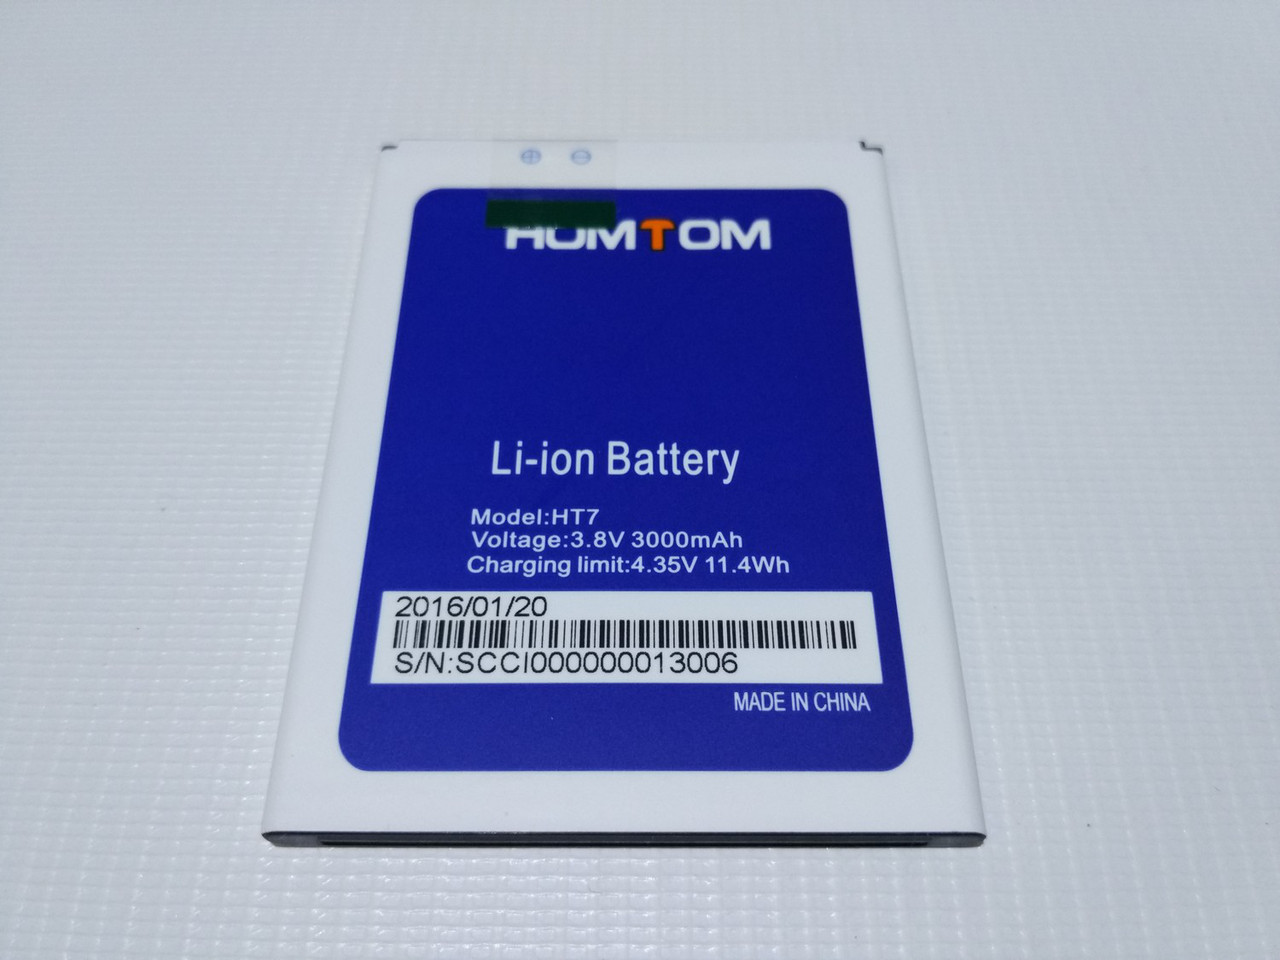 Оригинальная батарея аккумулятор для Homtom HT7, HT7 Pro, Ergo A550 Ma